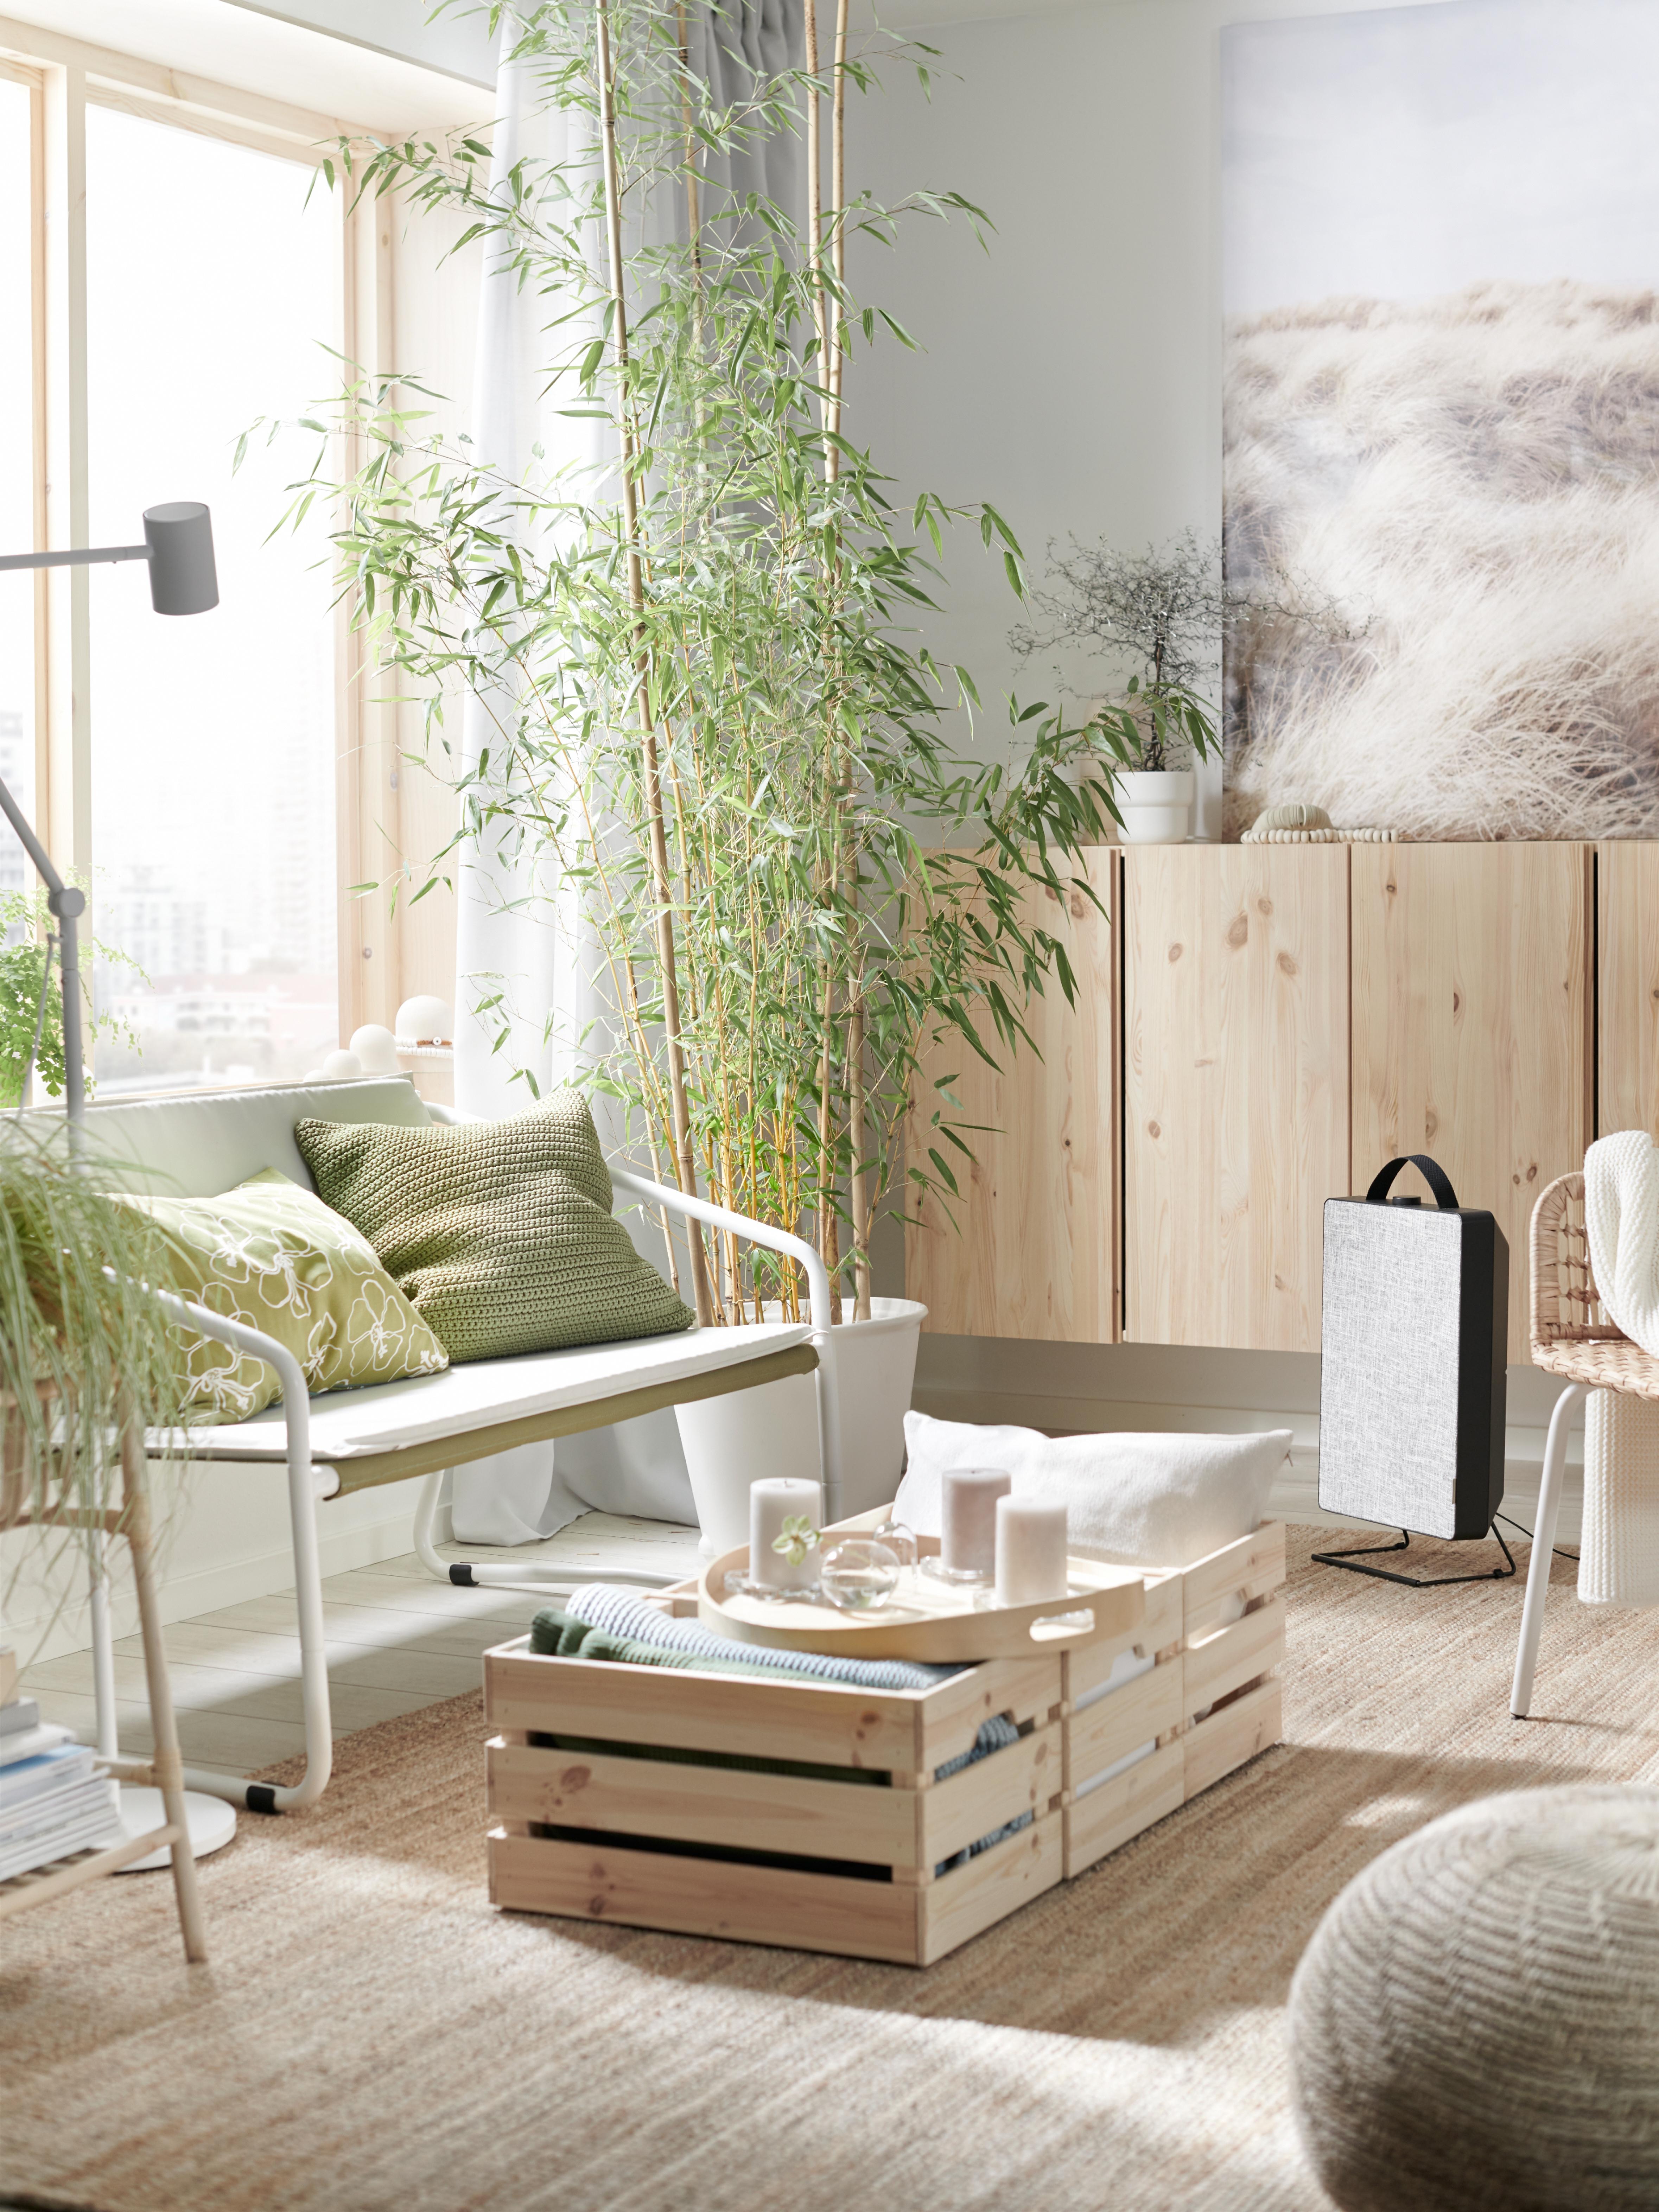 Living room with INGMARSÖ sofa, SANDARED pouffe, SÖTHOLMEN cushion covers, IVAR cabinet, KNAGGLIG box and air purifier.